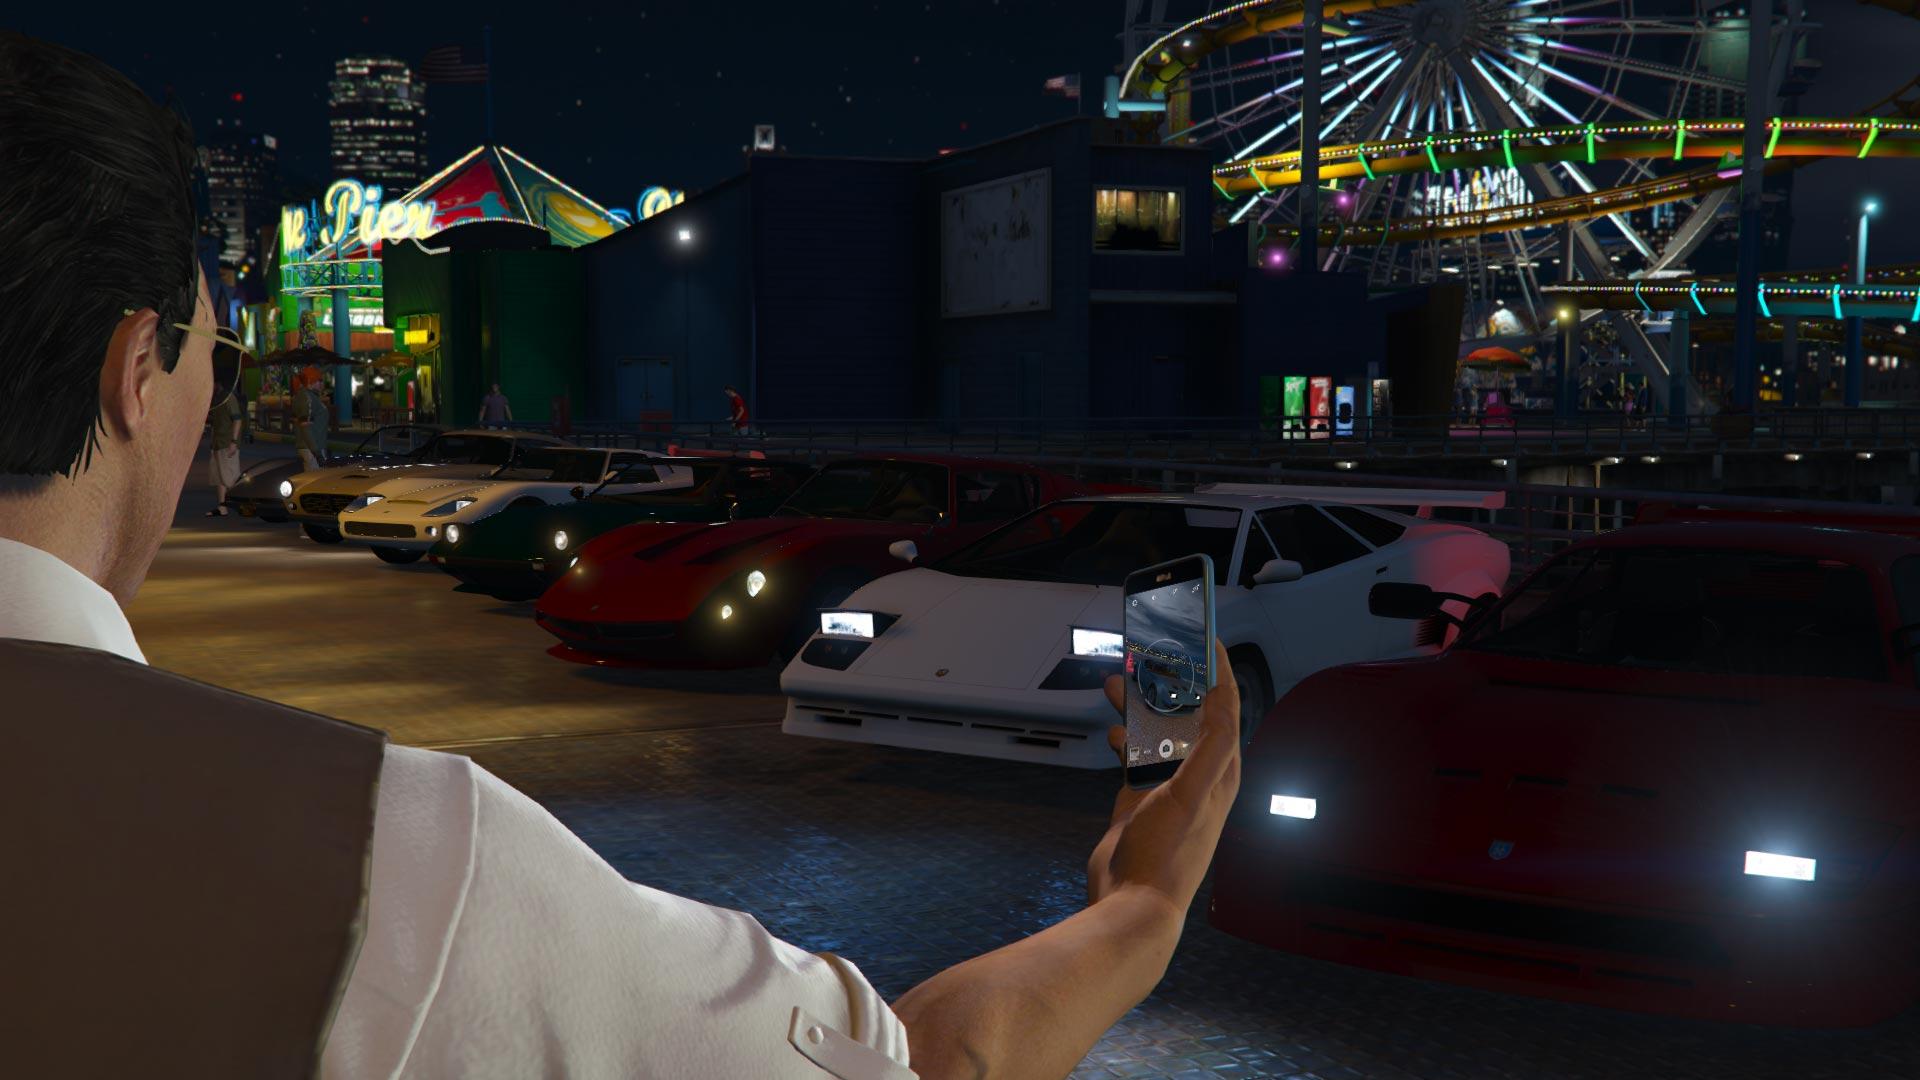 Grand-Theft-Auto-V-12_04_2018-11_59_02b.